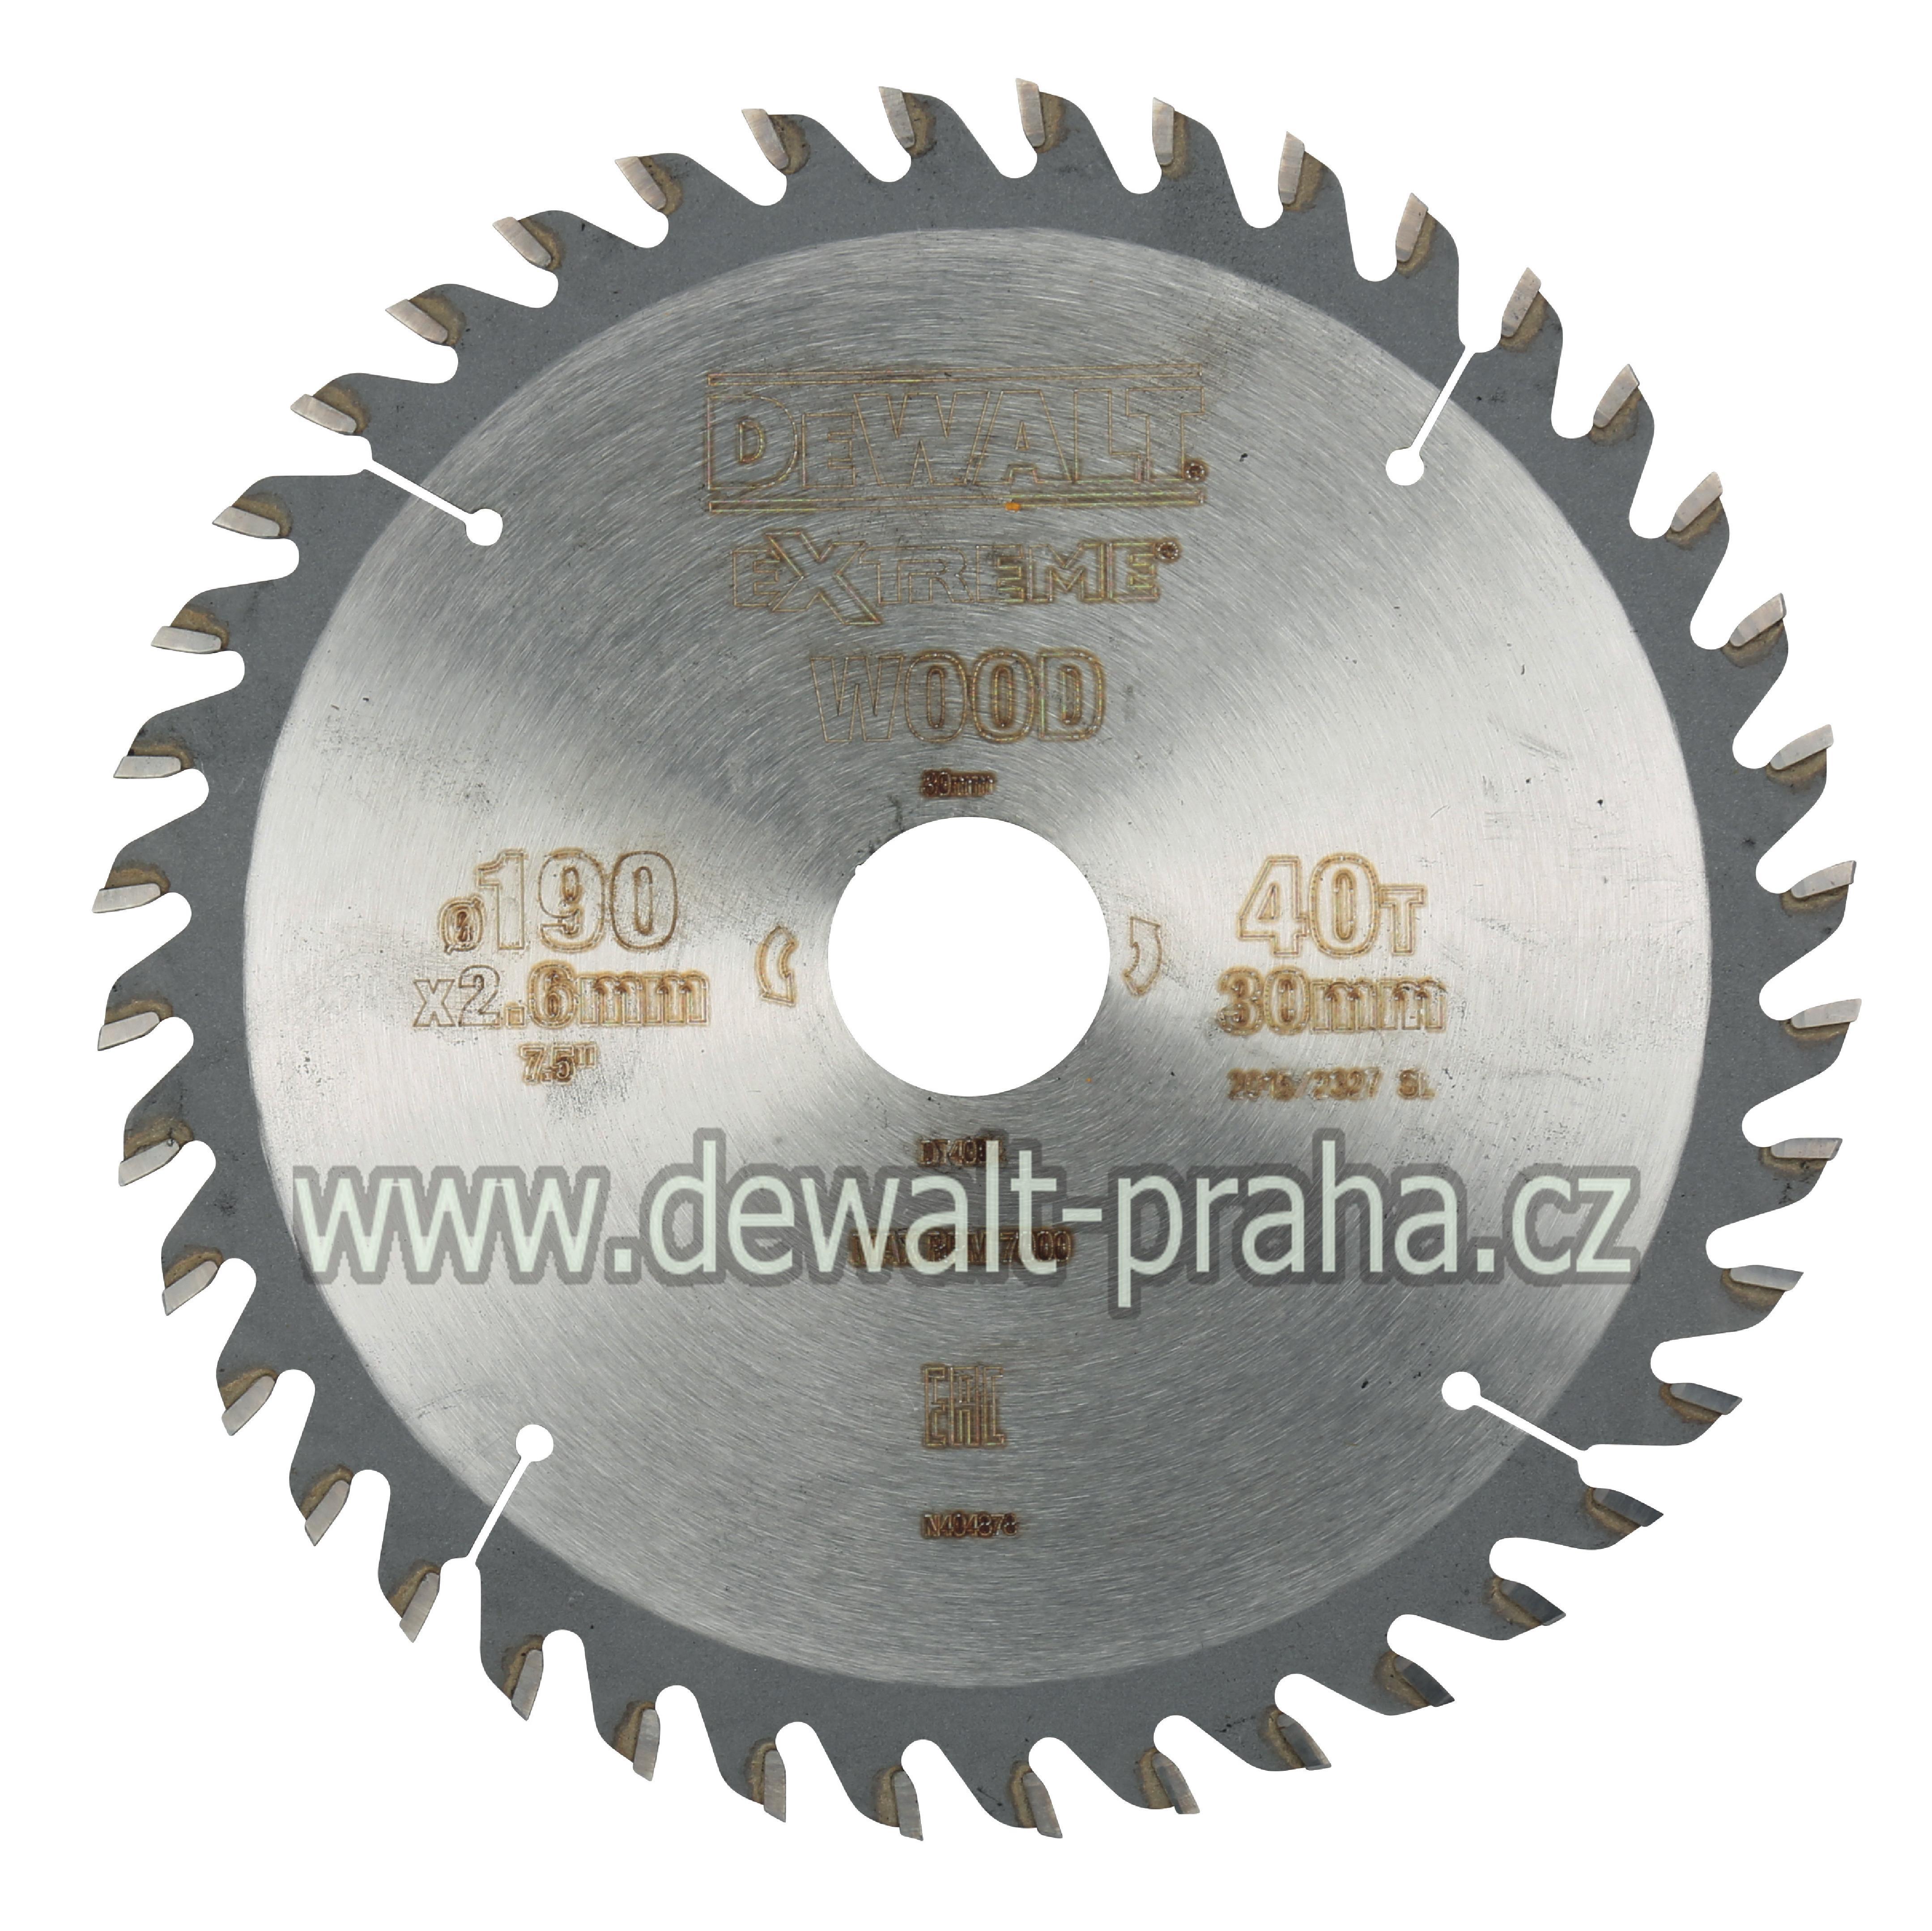 DT4064 DeWALT Pilový kotouč 190 x 30 mm, 40 zubů